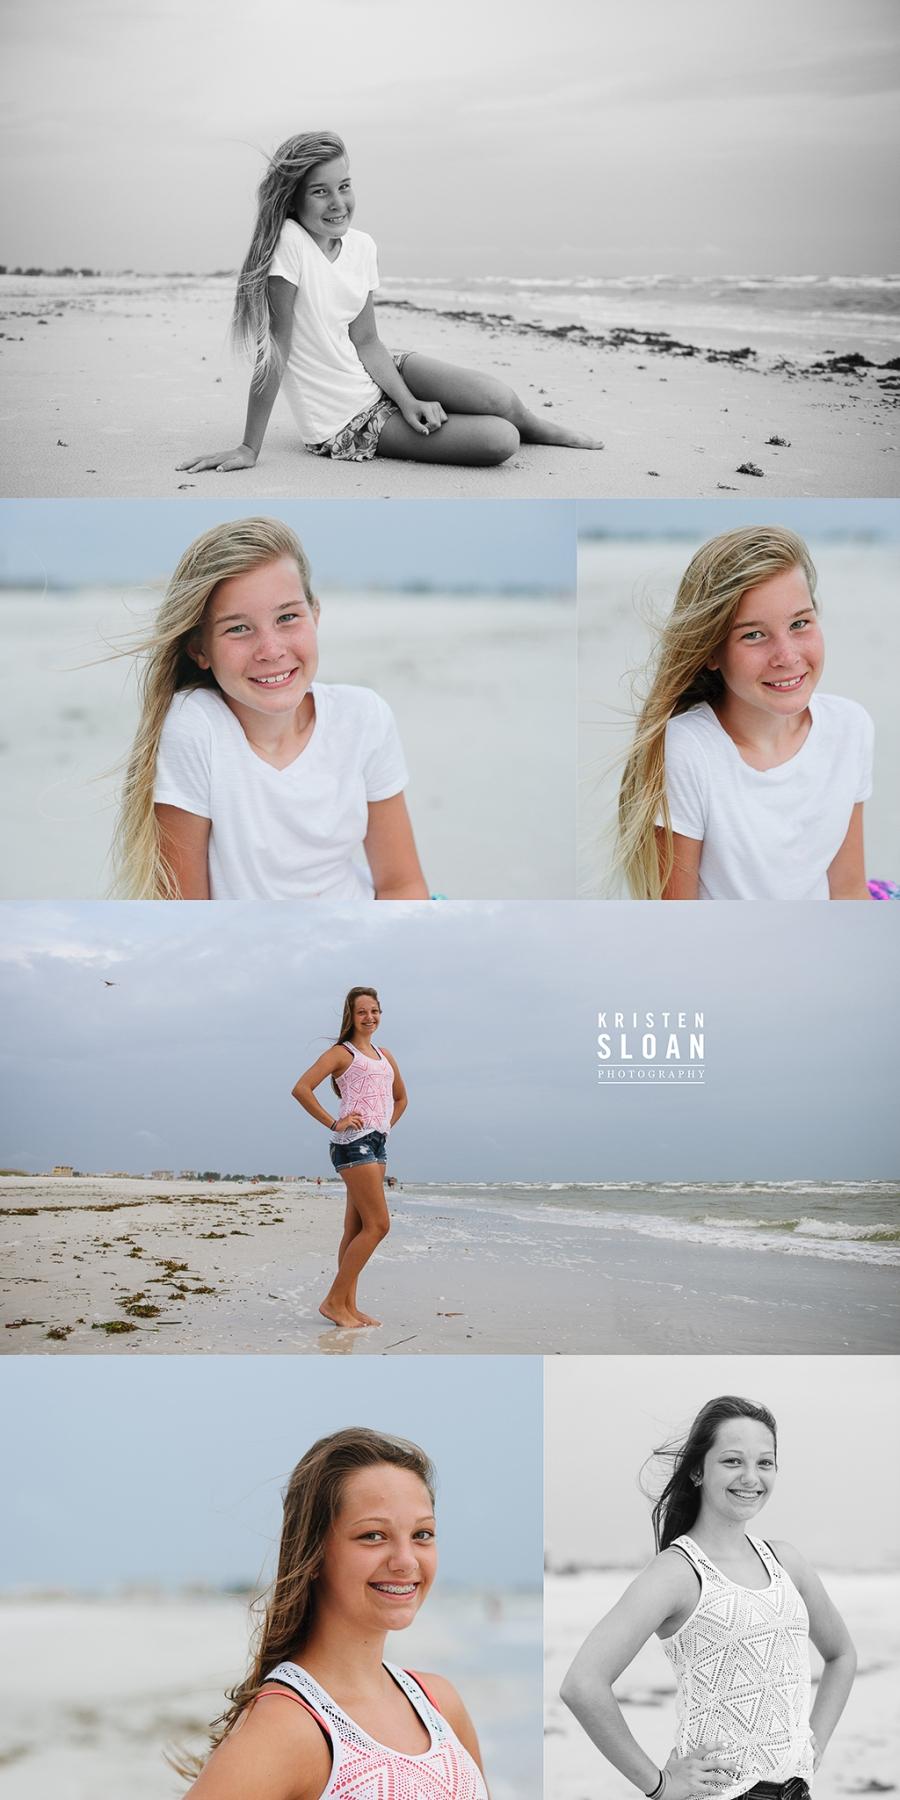 Treasure Island Beach FL Family Reunion Sunset Portraits by Kristen Sloan Photography